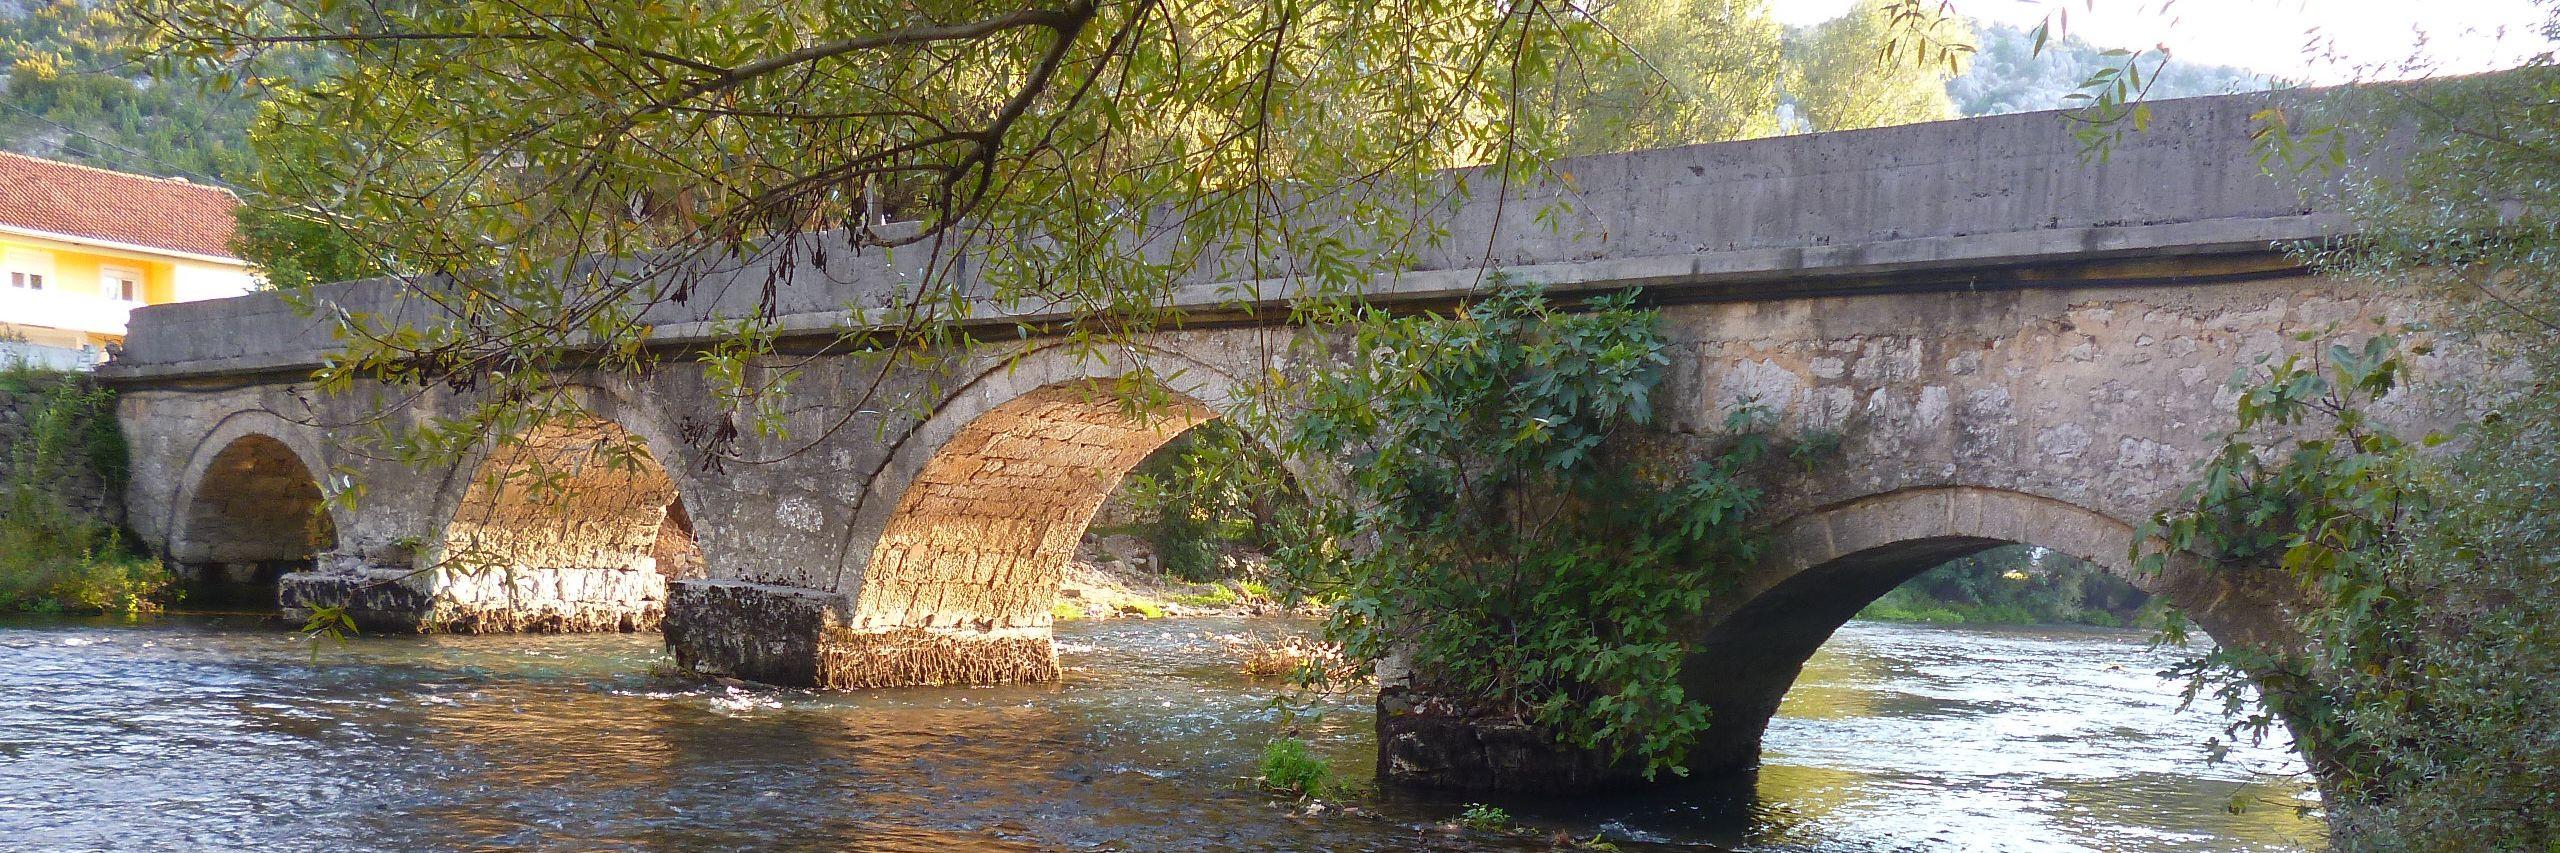 Караджозбегов мост